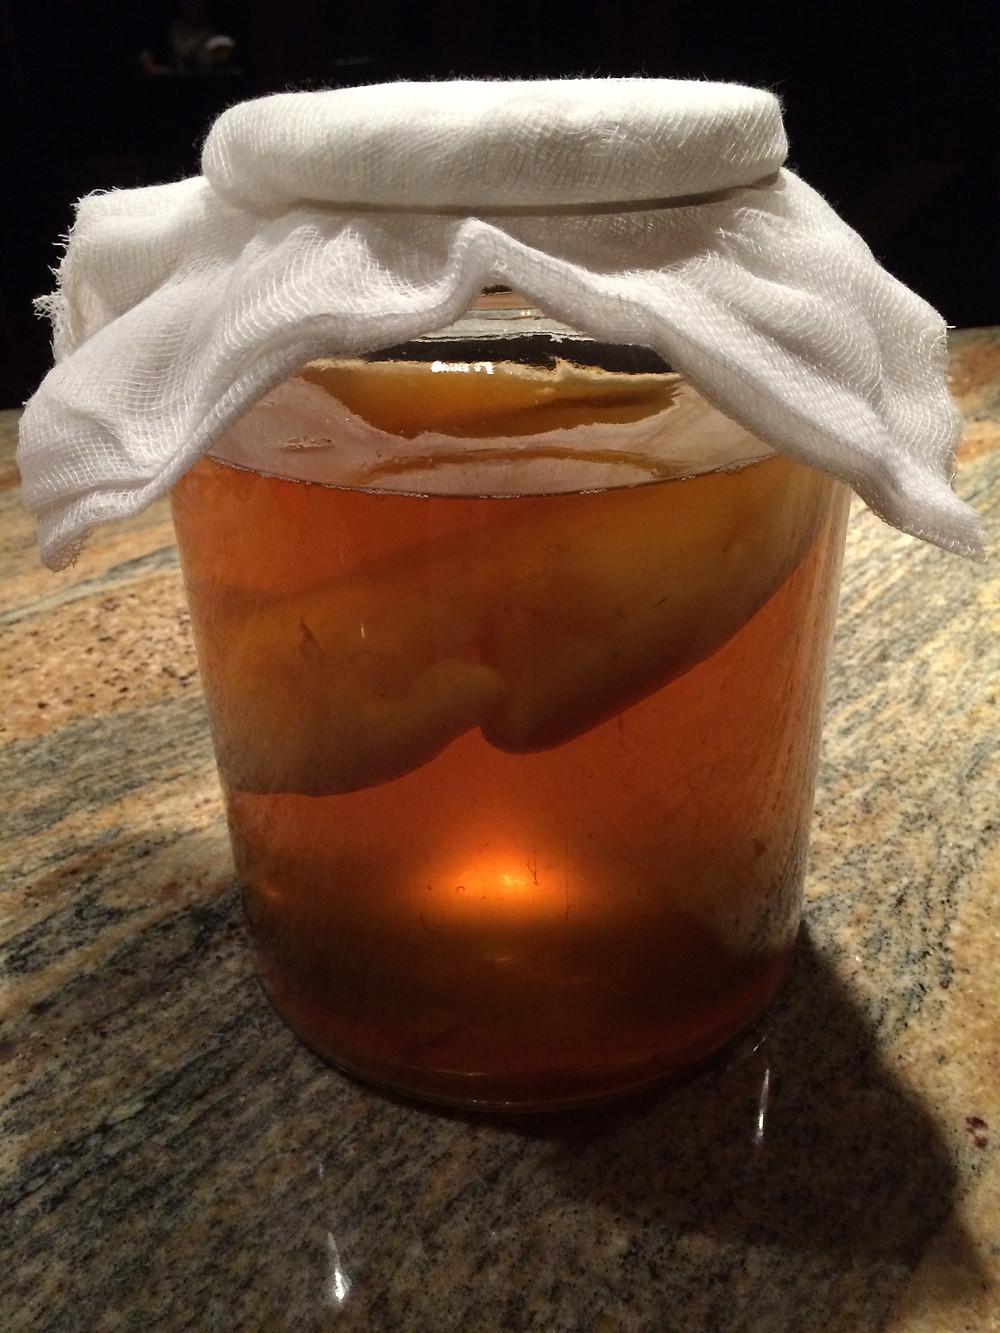 kombucha brewing in a jar